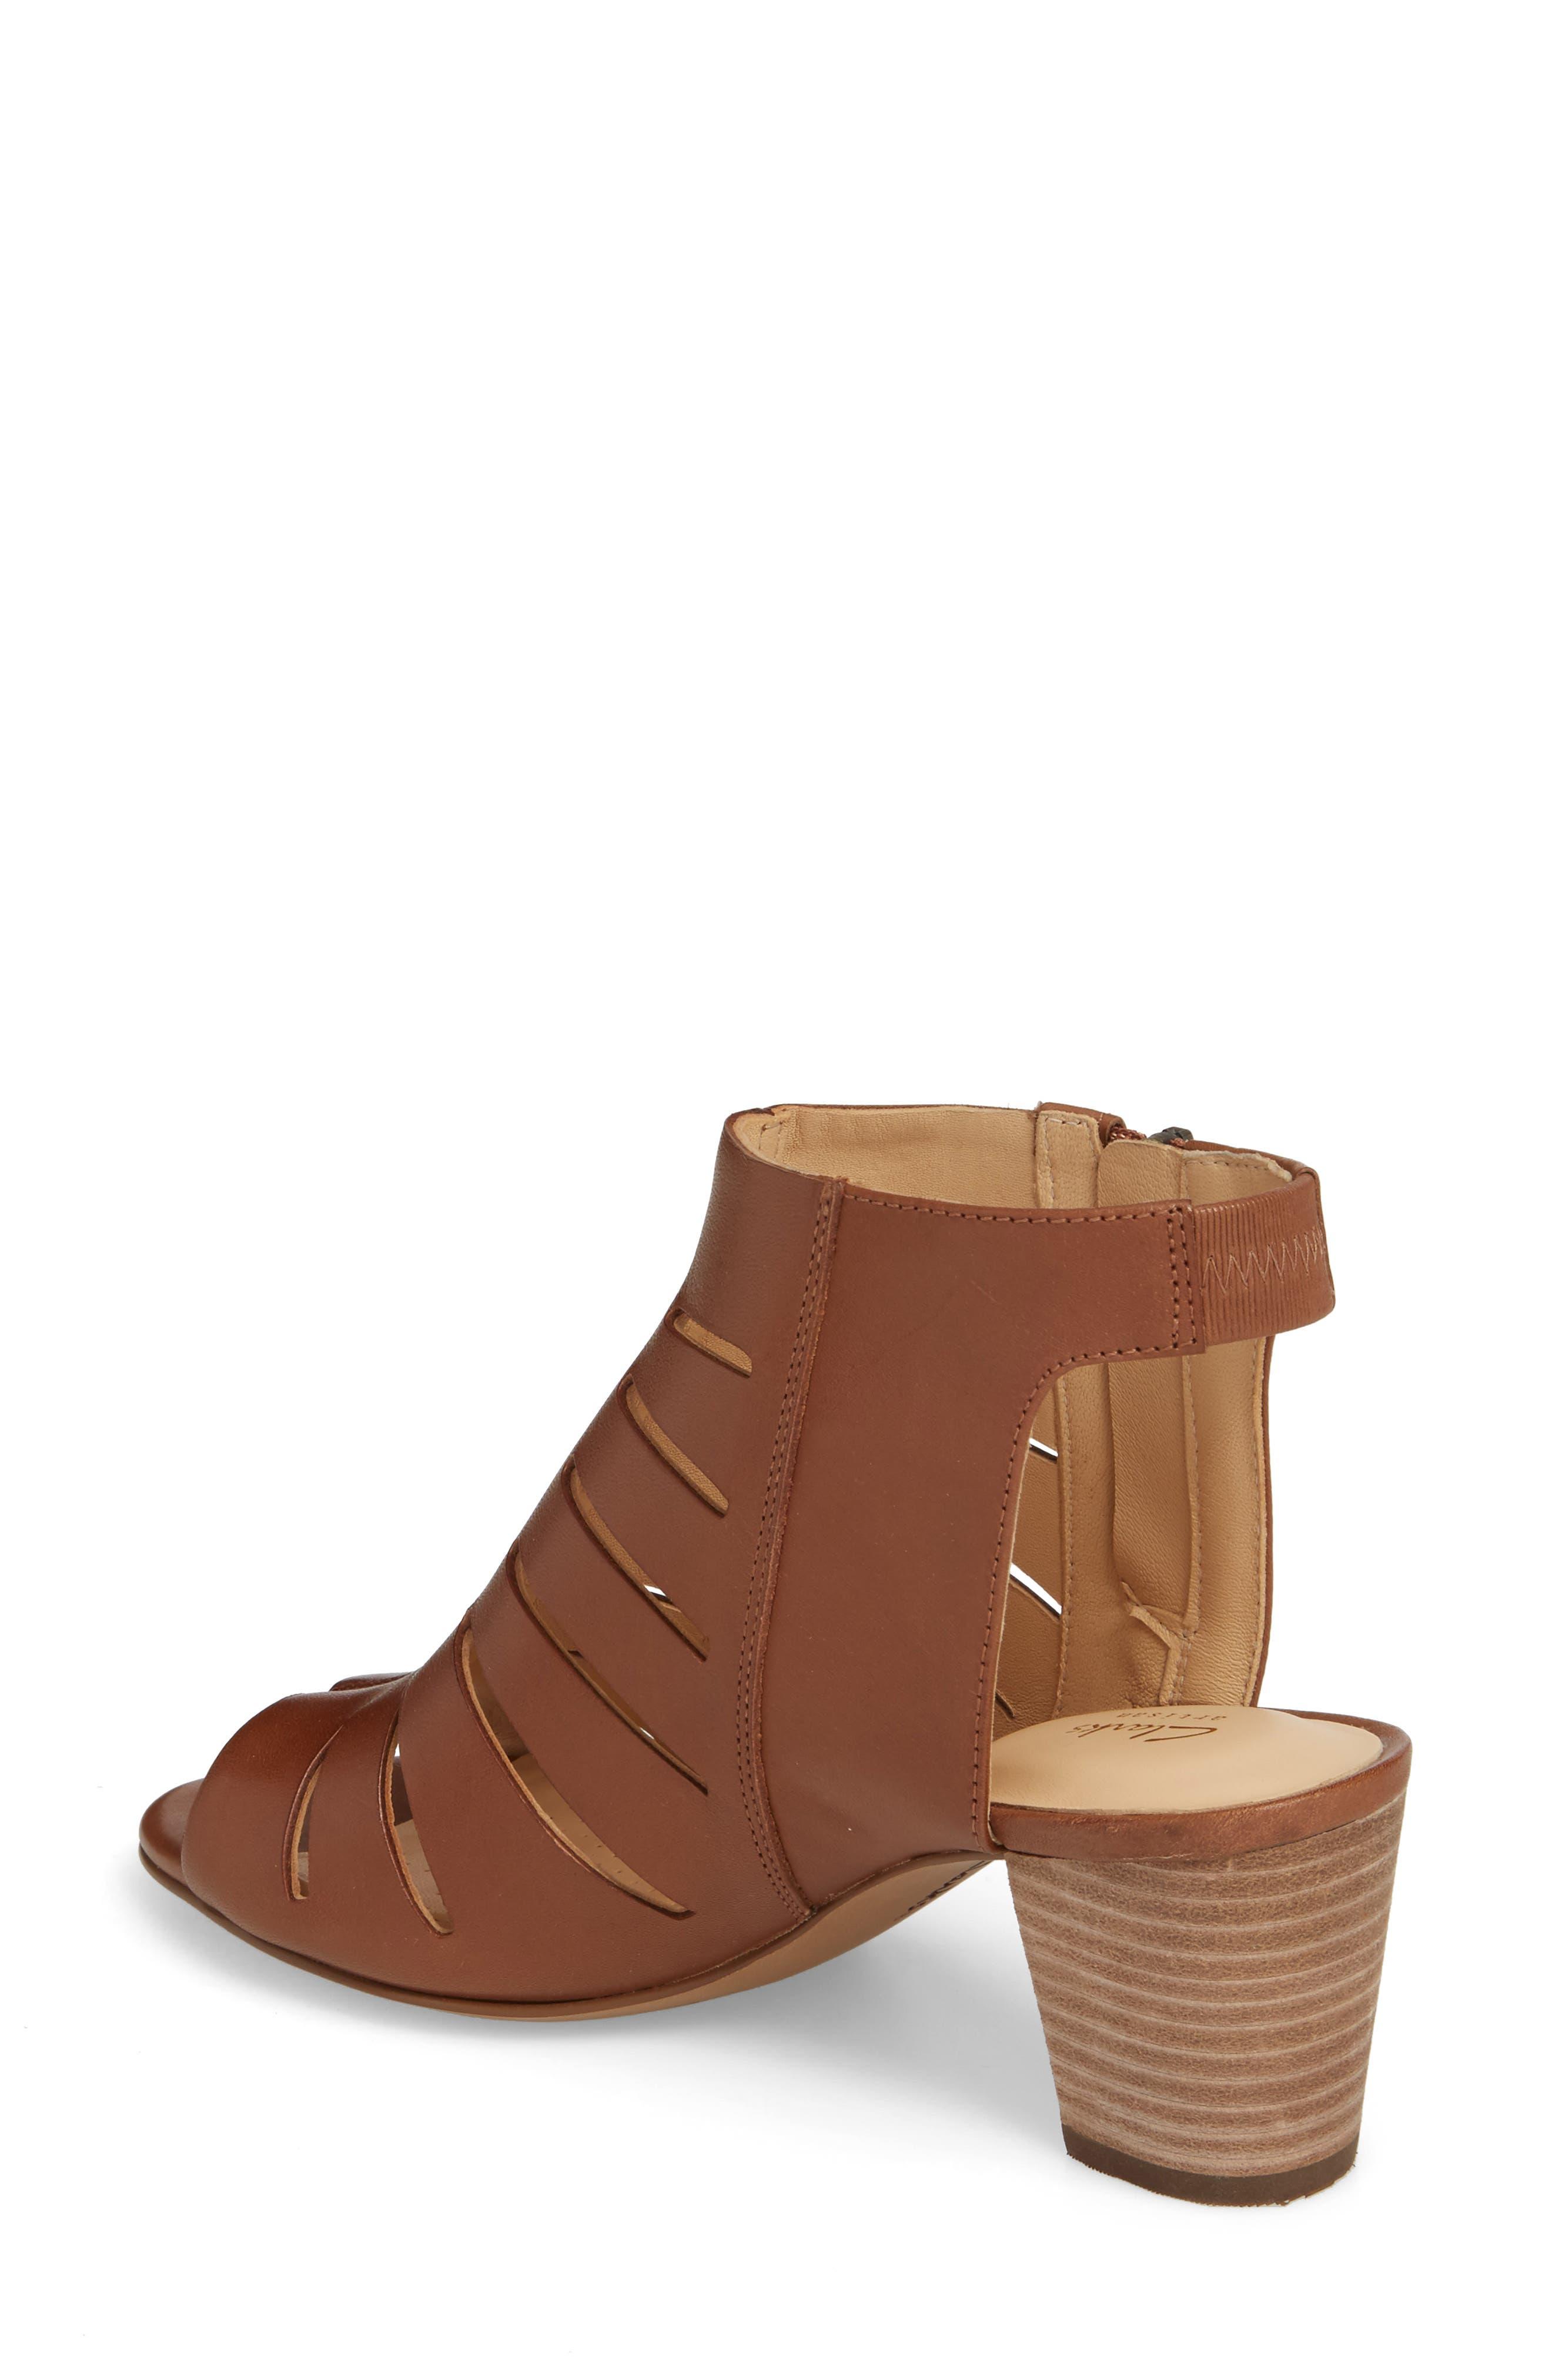 Deloria Ivy Sandal,                             Alternate thumbnail 2, color,                             Tan Leather